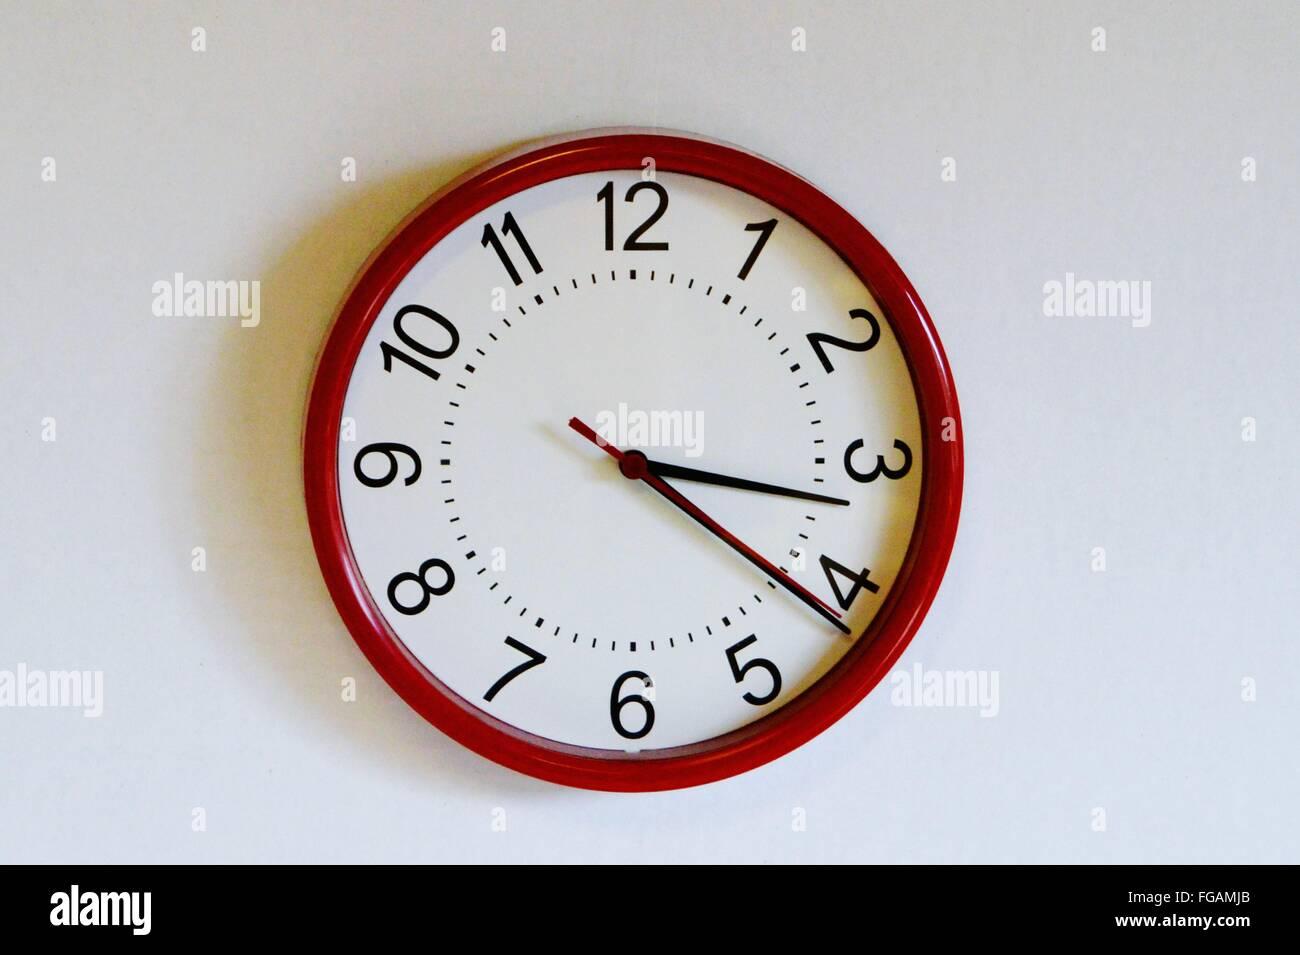 Close-Up Of Wall Clock - Stock Image